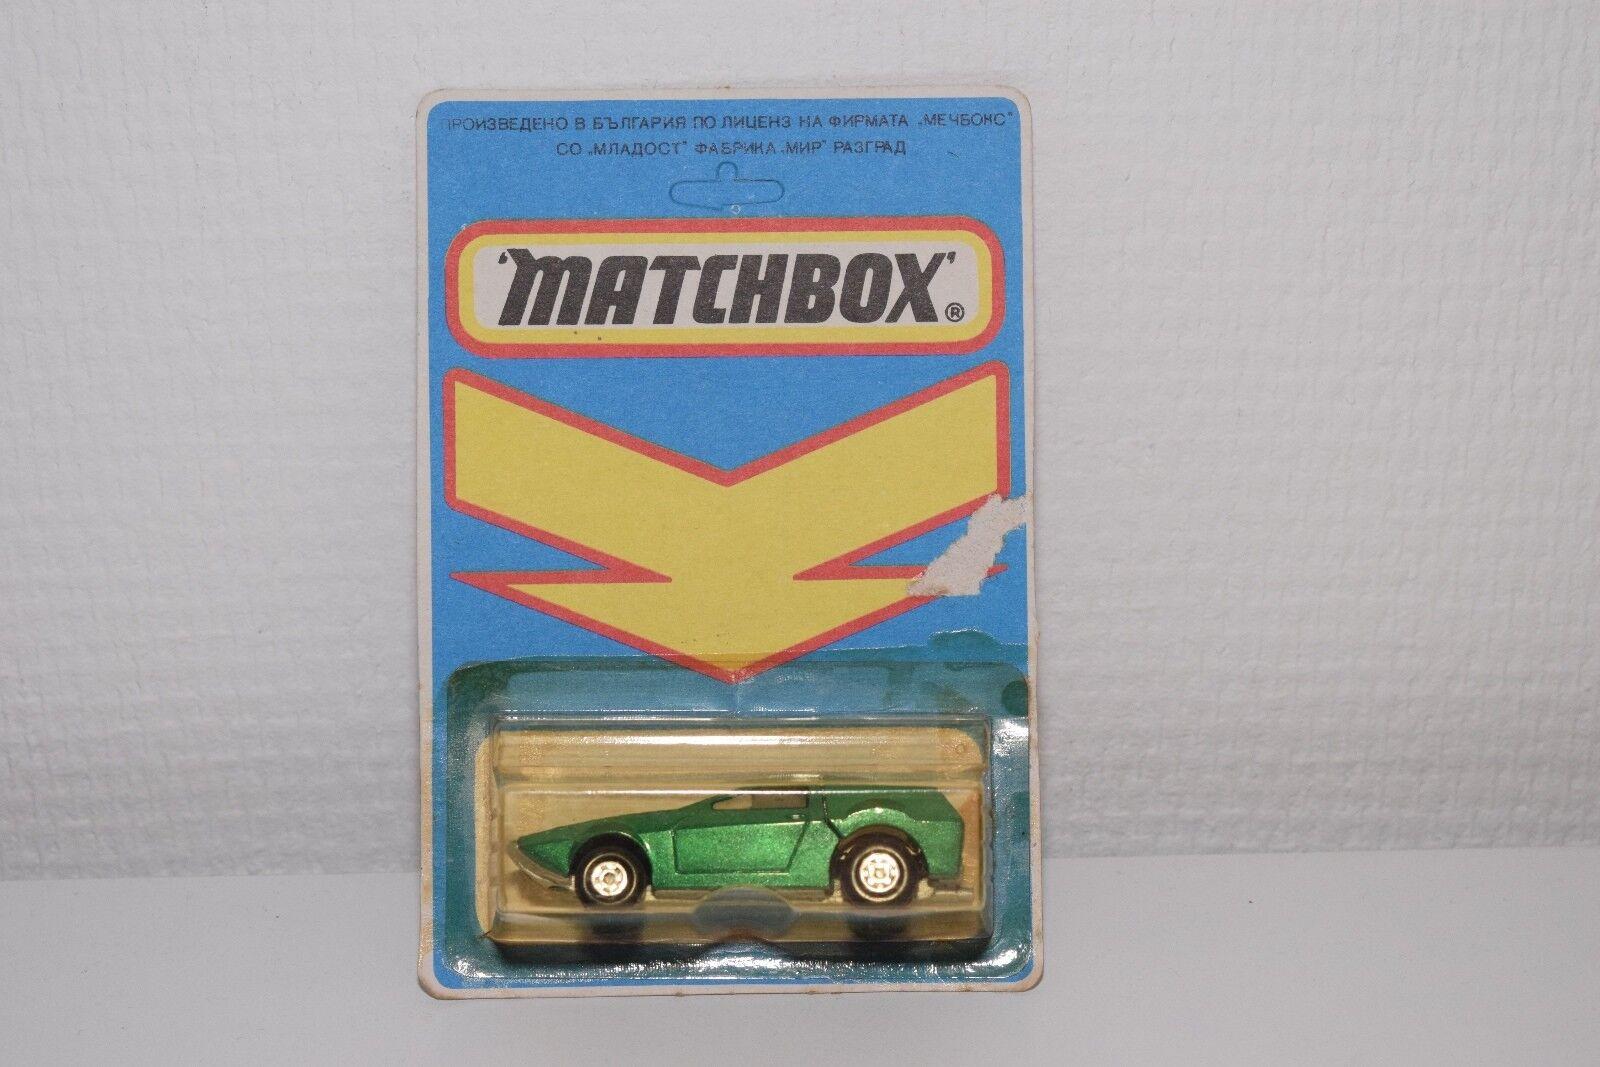 ^^^ MATCHBOX MIDNIGHT MAGIC RUFF TREK METALLIC GREEN MINT BOXED BULGARIAN RARE